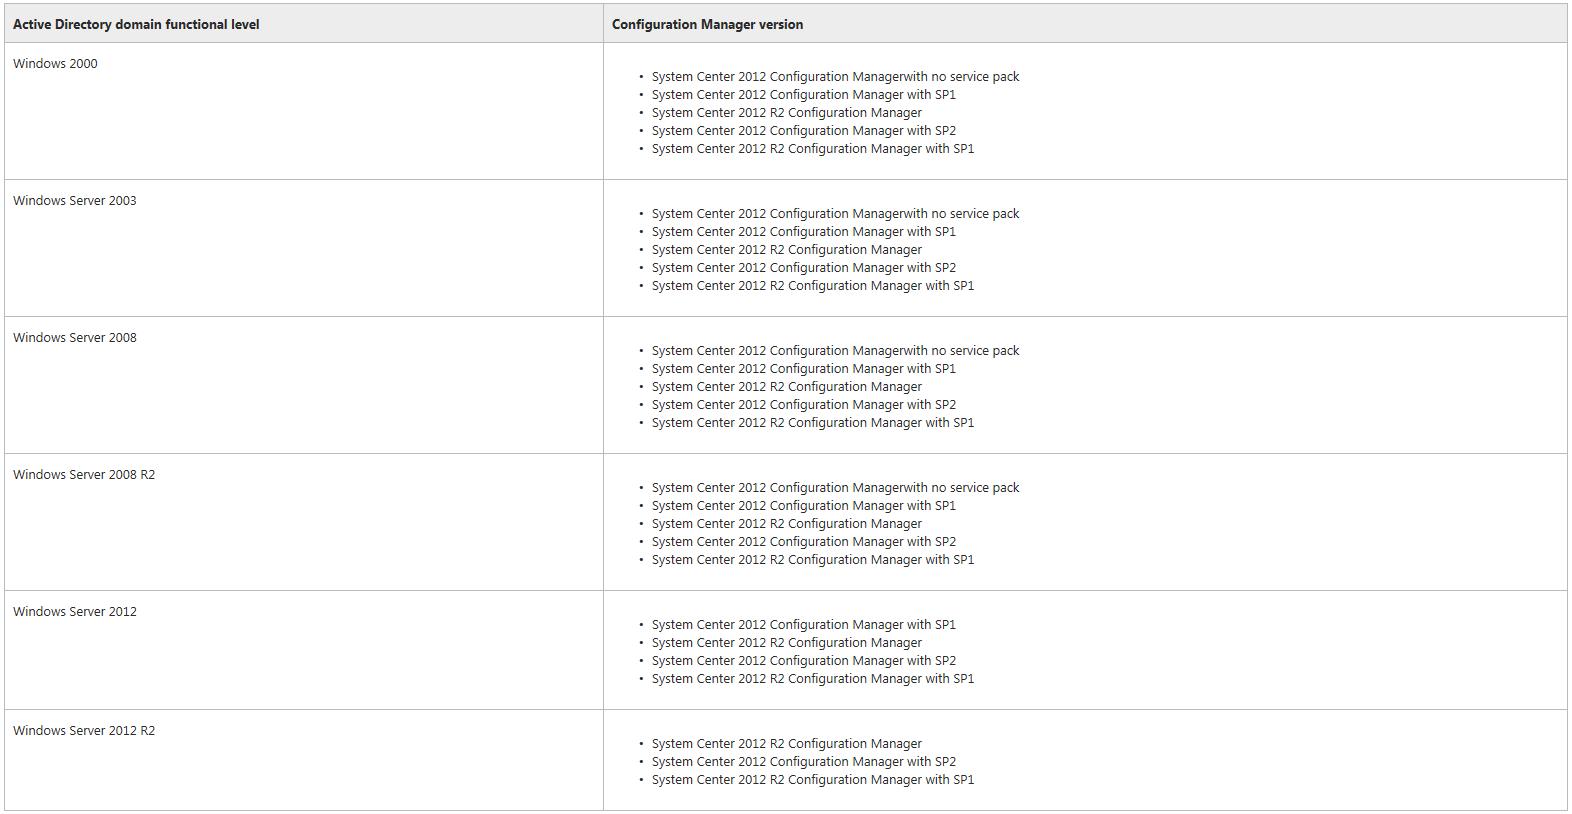 1.6. System Center Configuration Manager 2012 R2 Tarafından Desteklenen Active Directory Domainleri